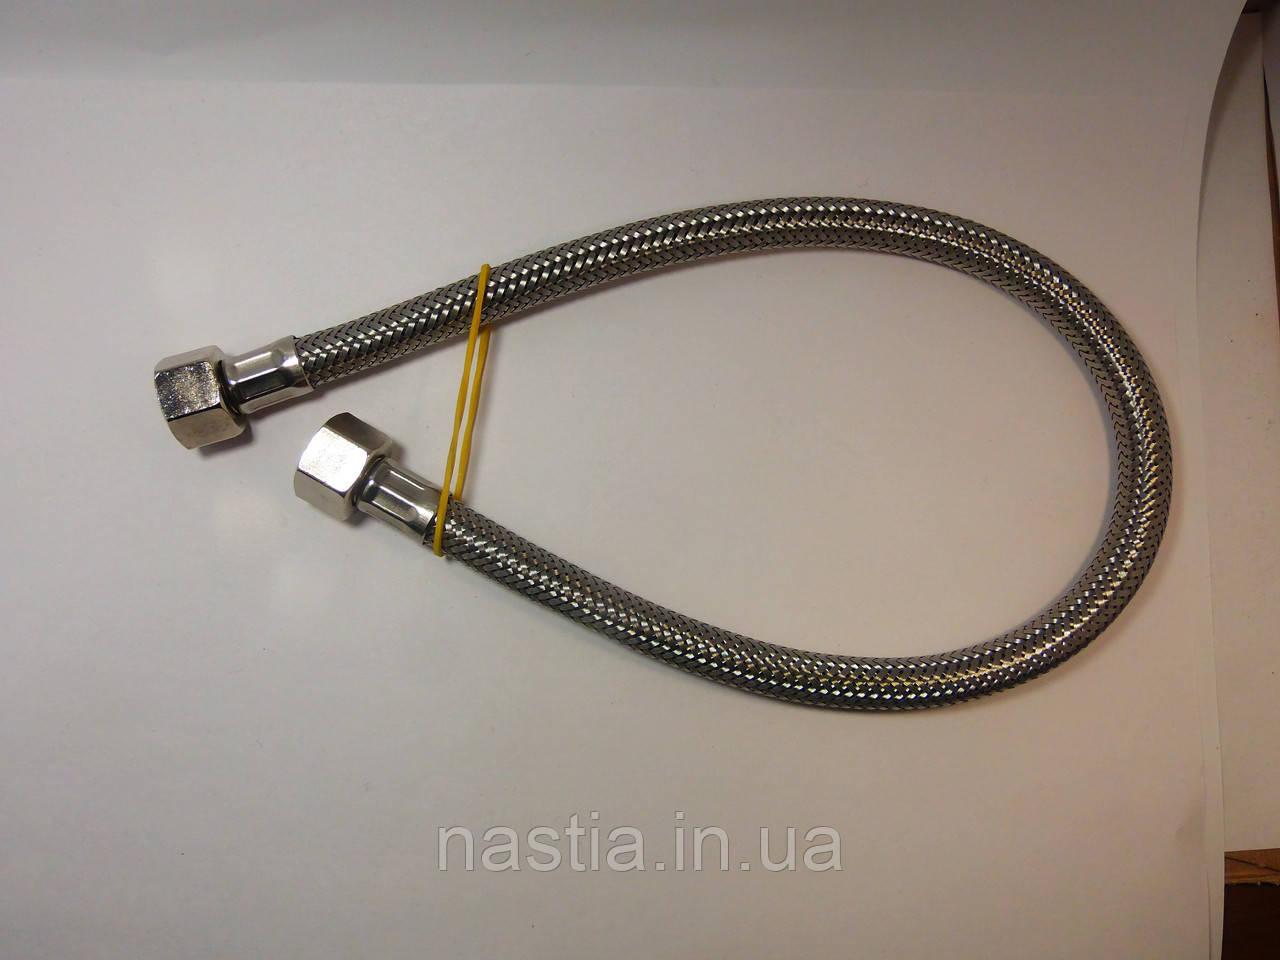 V177 Гнучка трубка у сталевій обмотці, 3/8-3/8(мама-мама), L=500mm